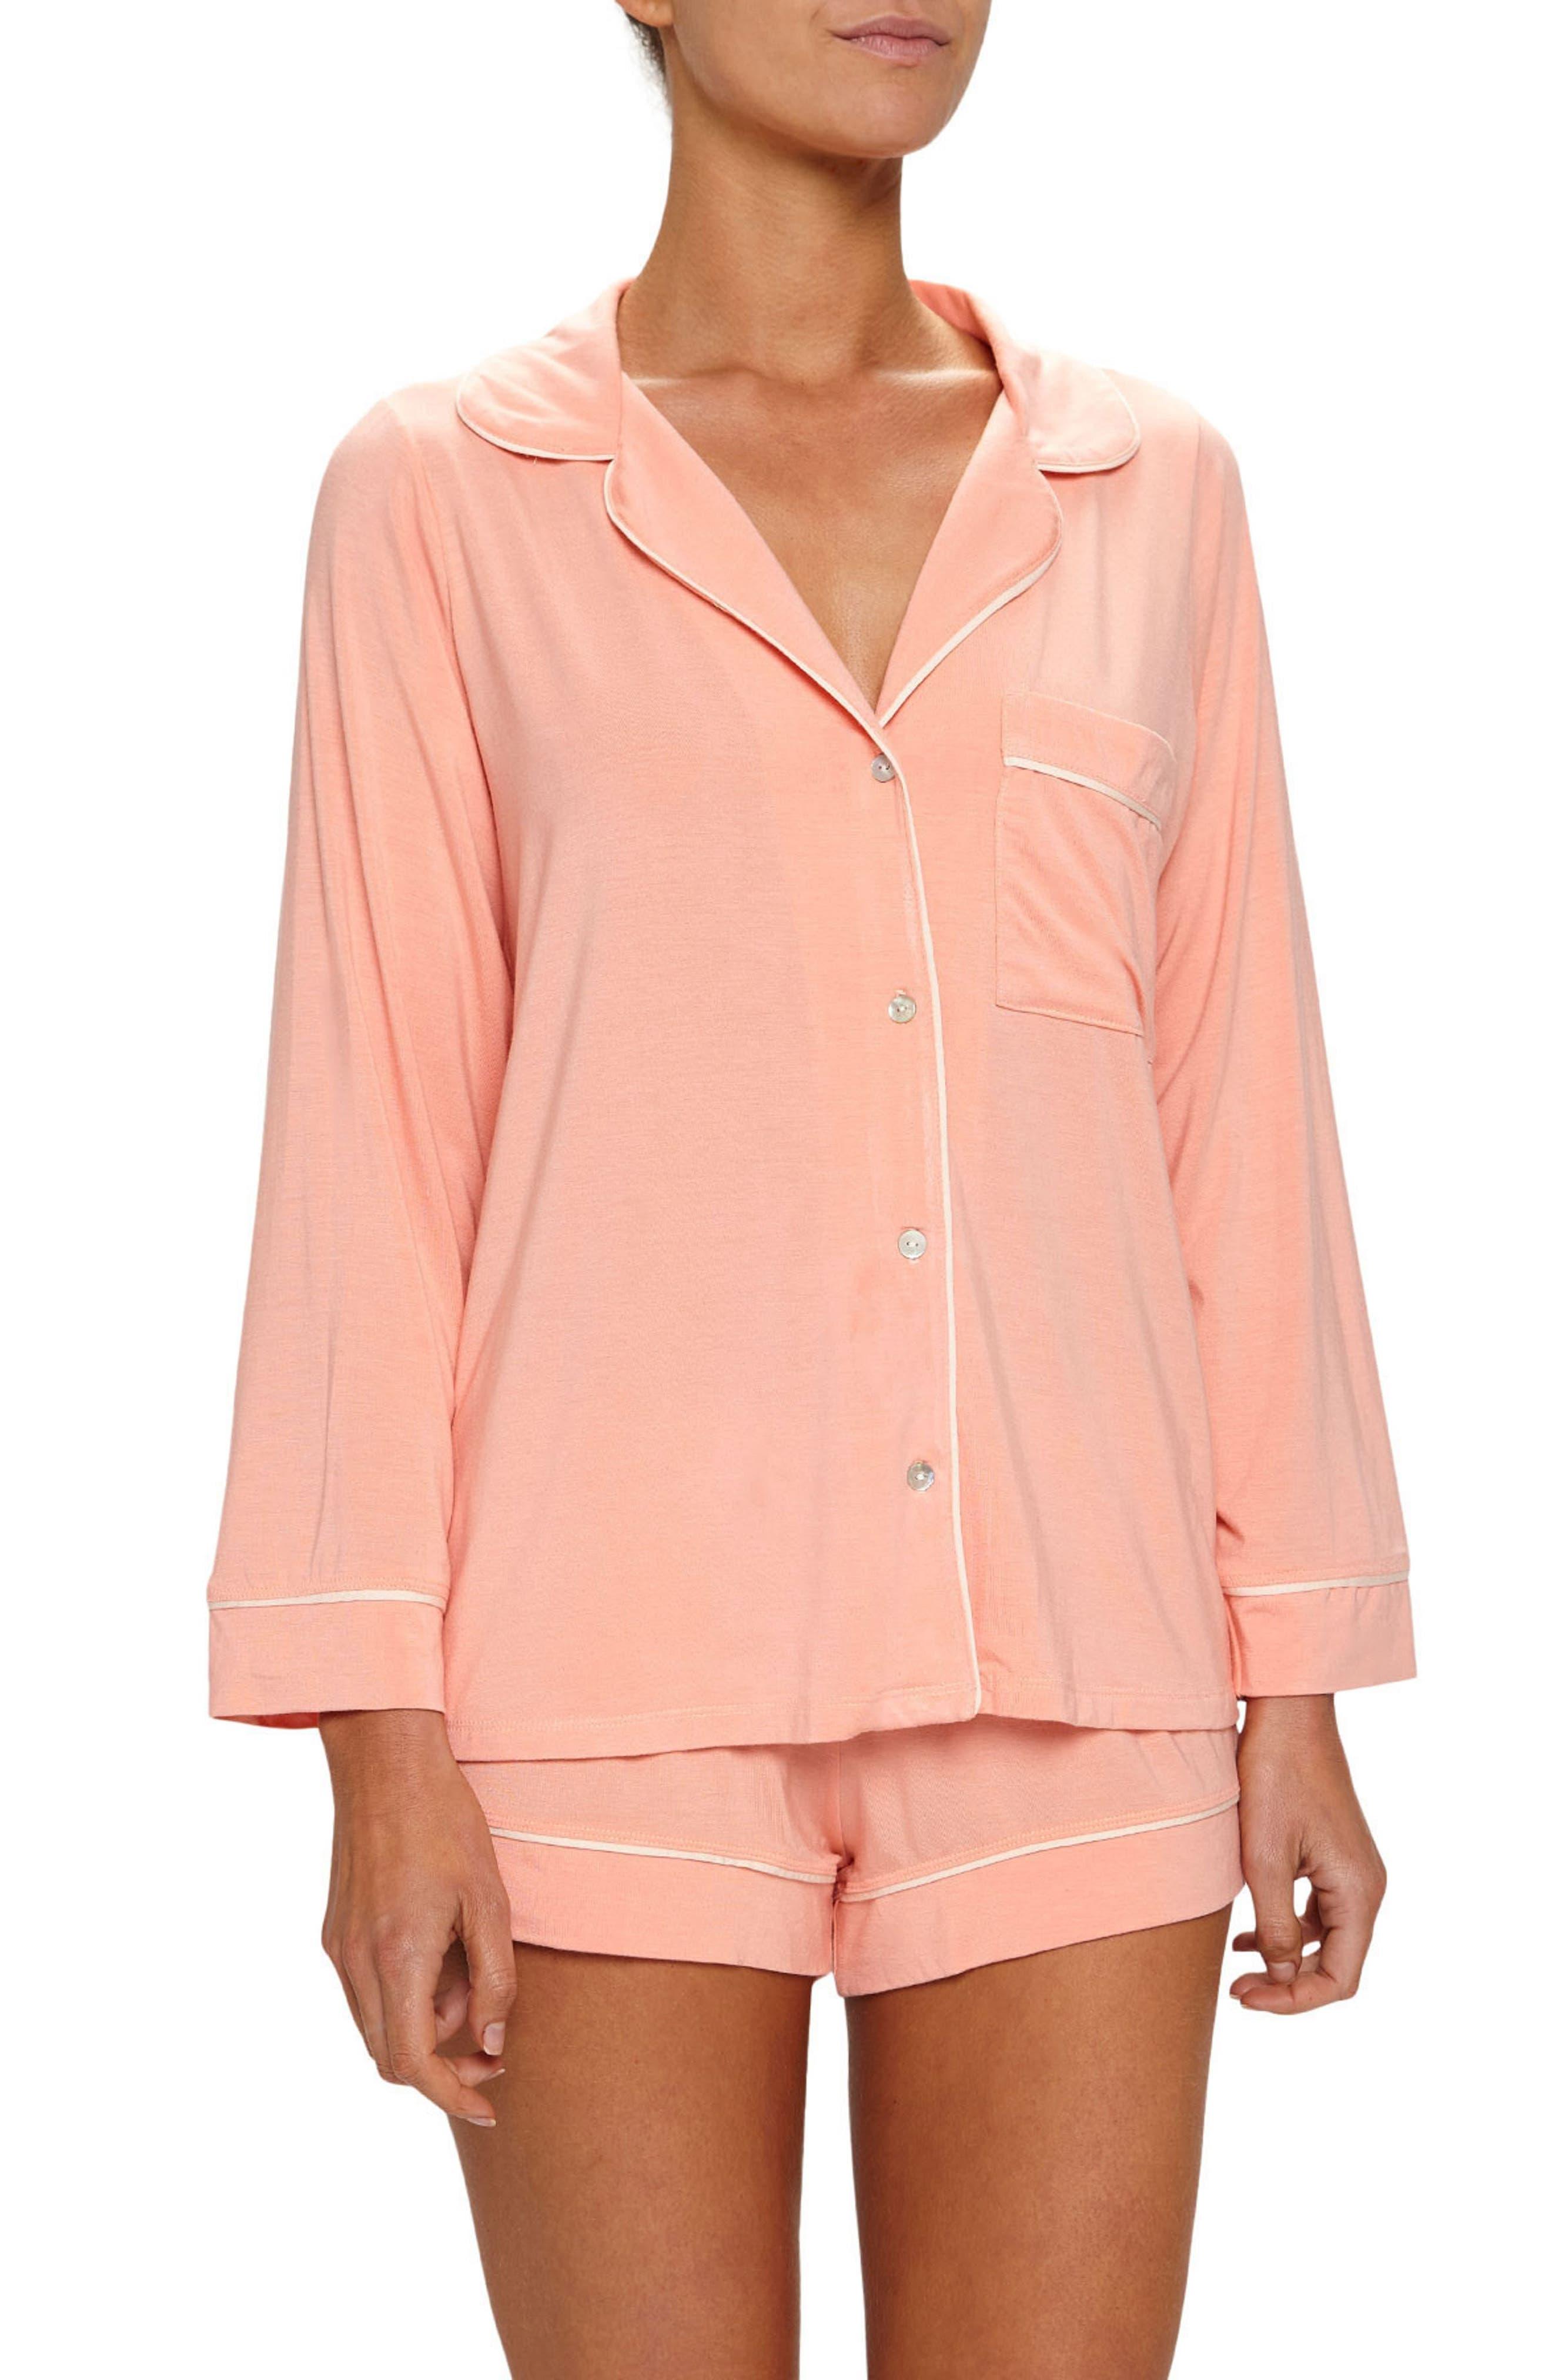 'Gisele' Short Pajamas,                         Main,                         color, Guava/ Bellini